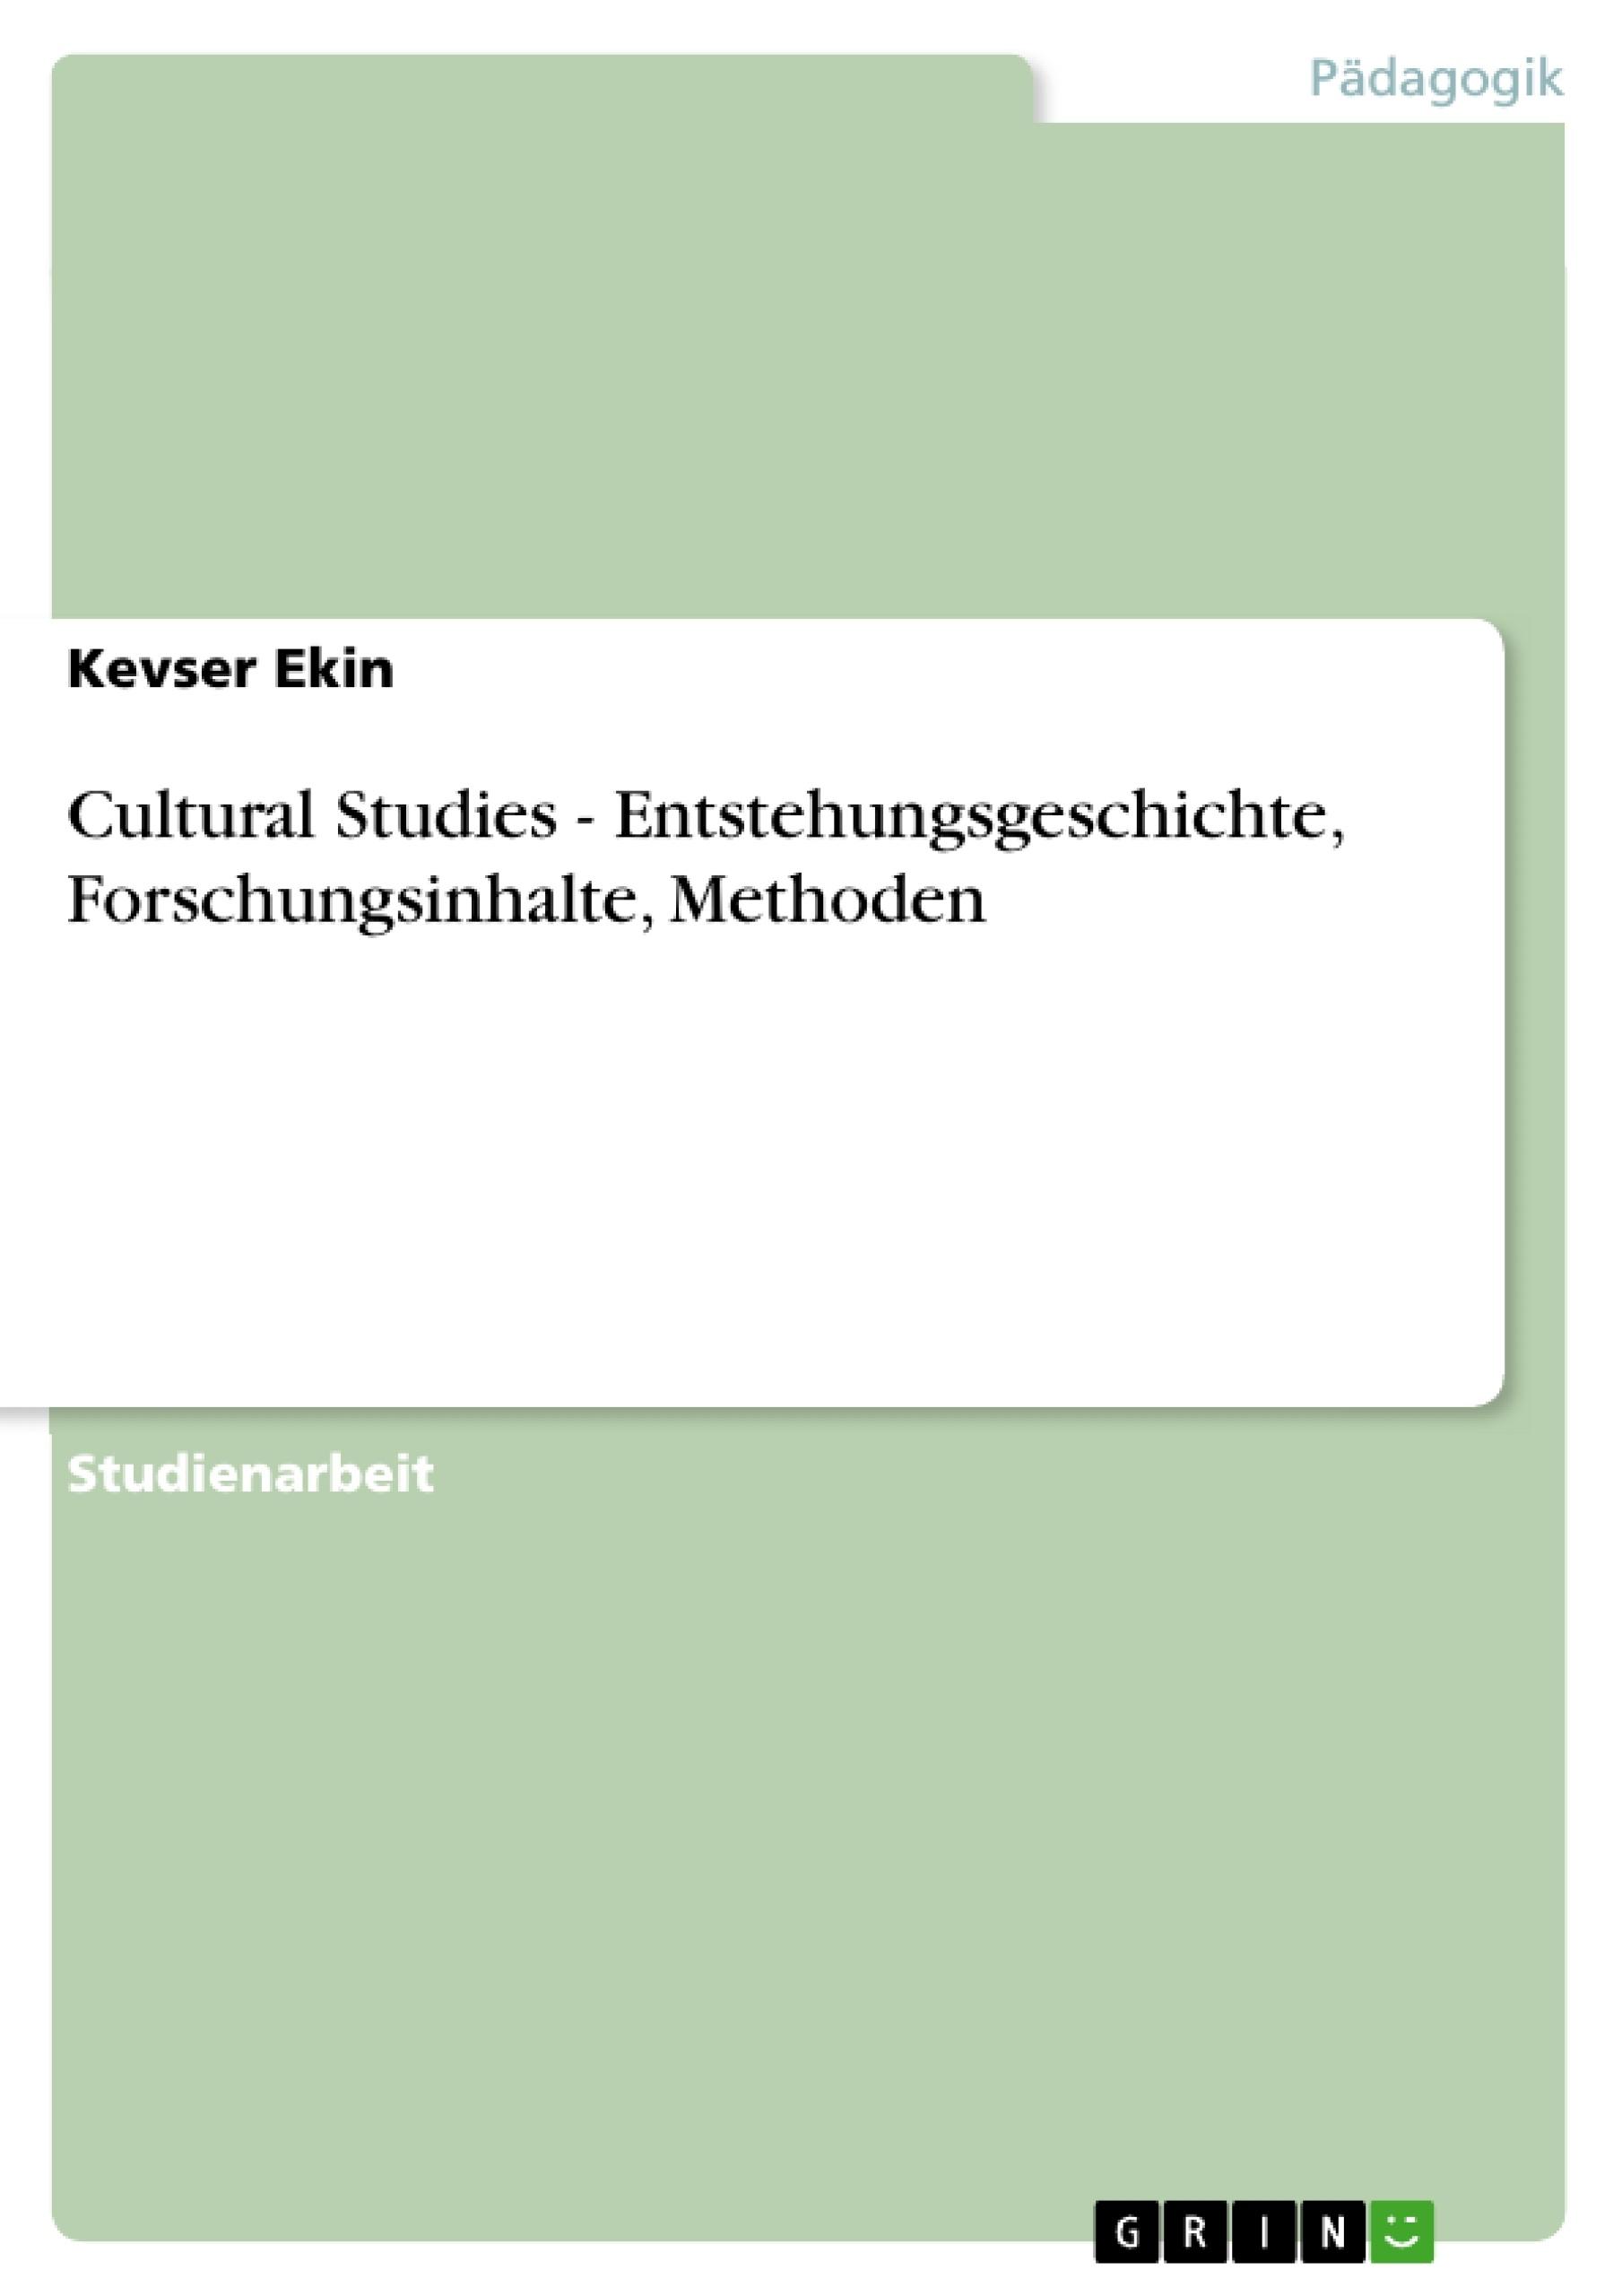 Titel: Cultural Studies - Entstehungsgeschichte, Forschungsinhalte, Methoden